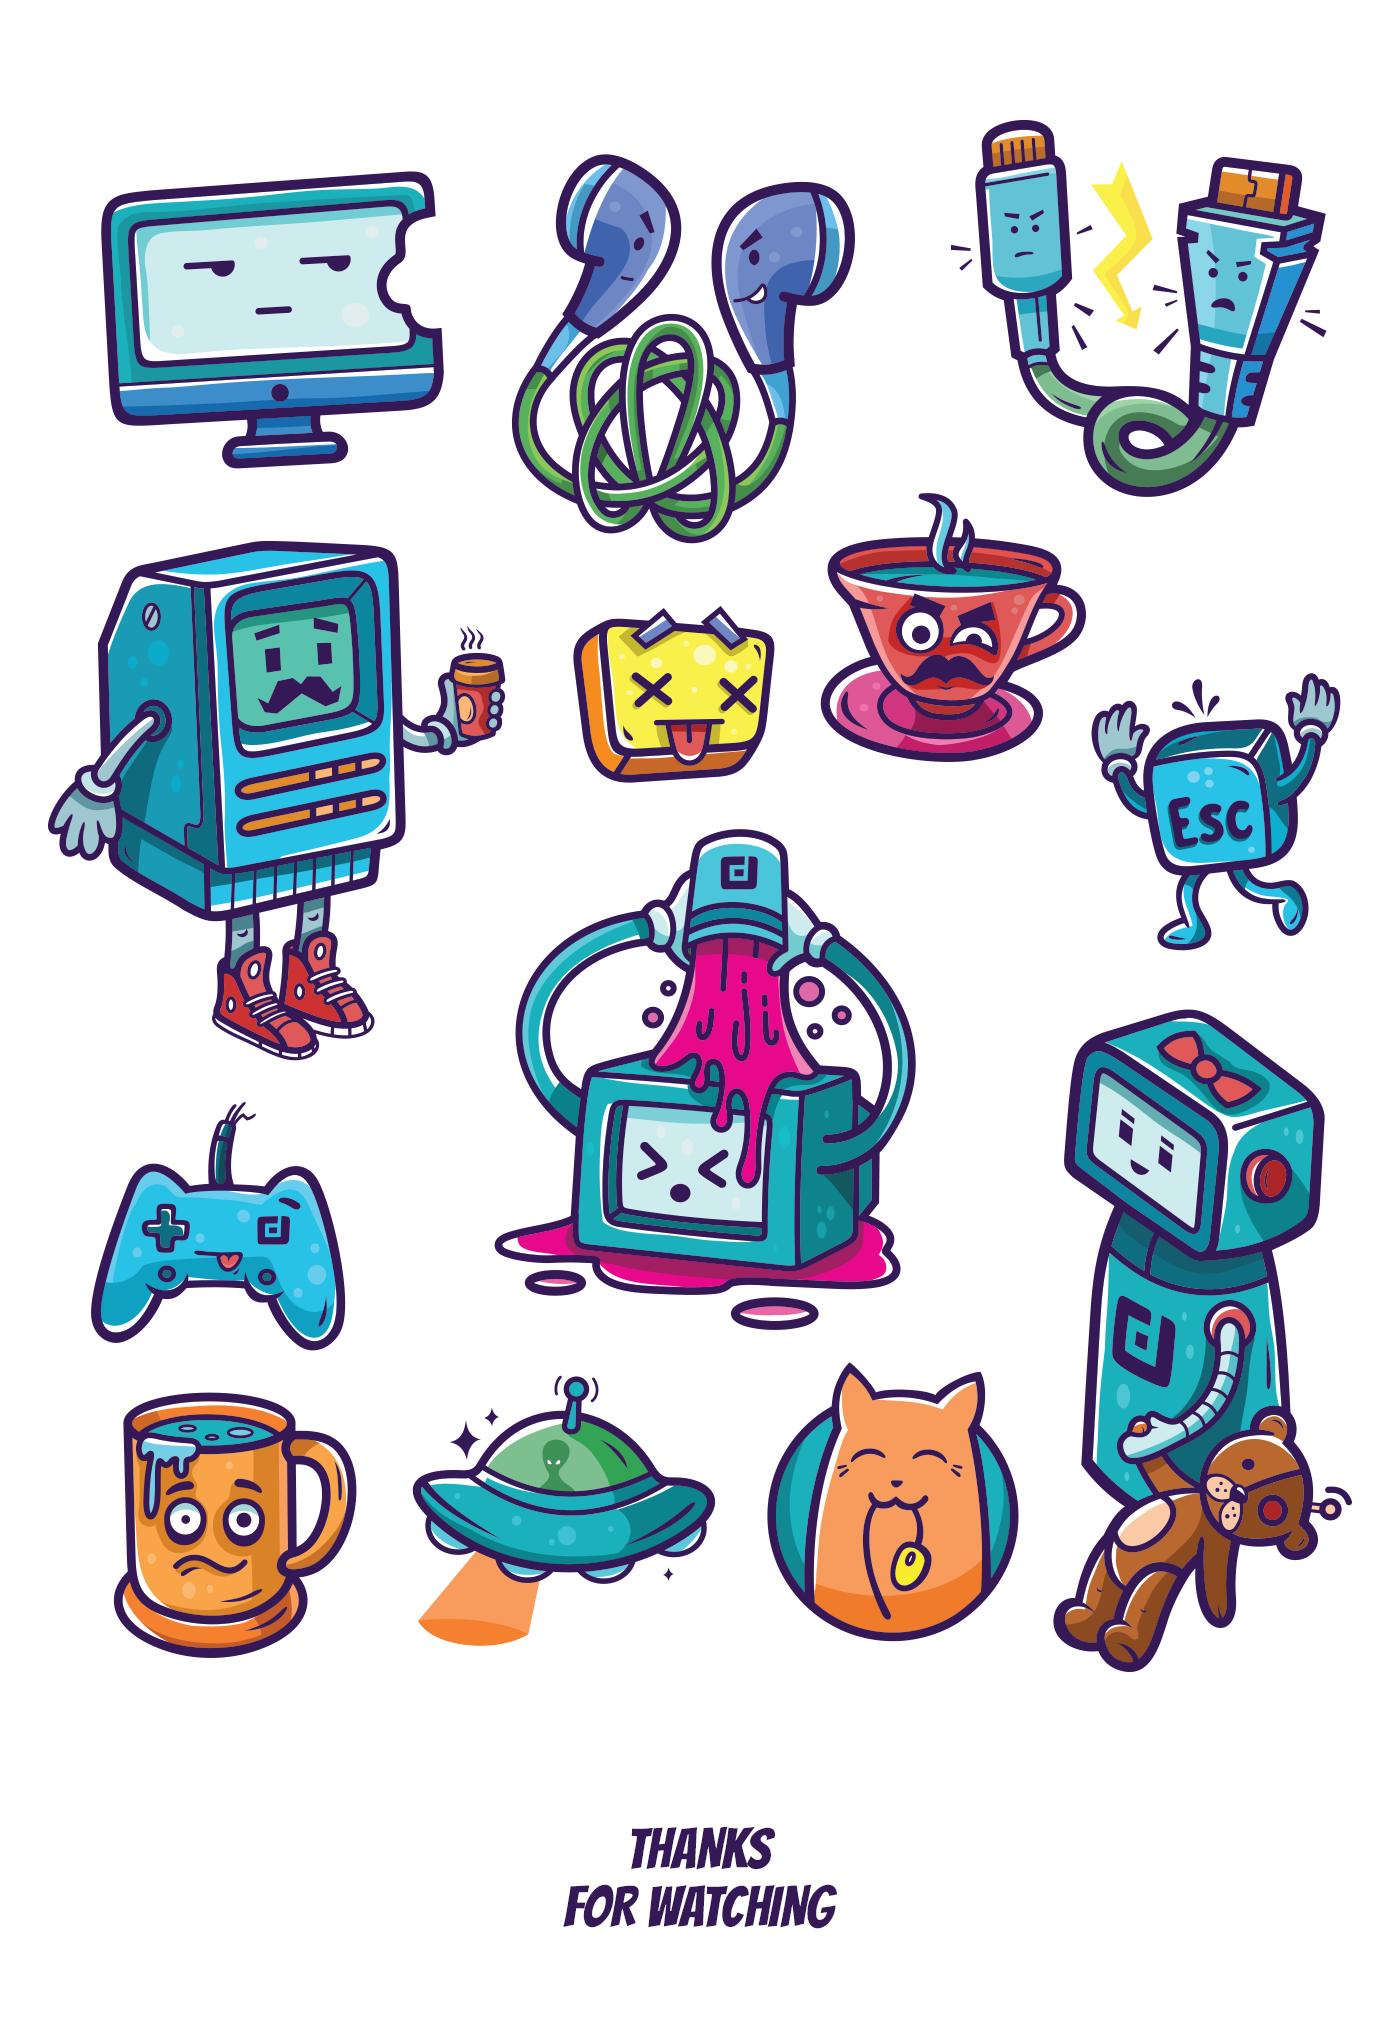 Opendev - Sticker Pack